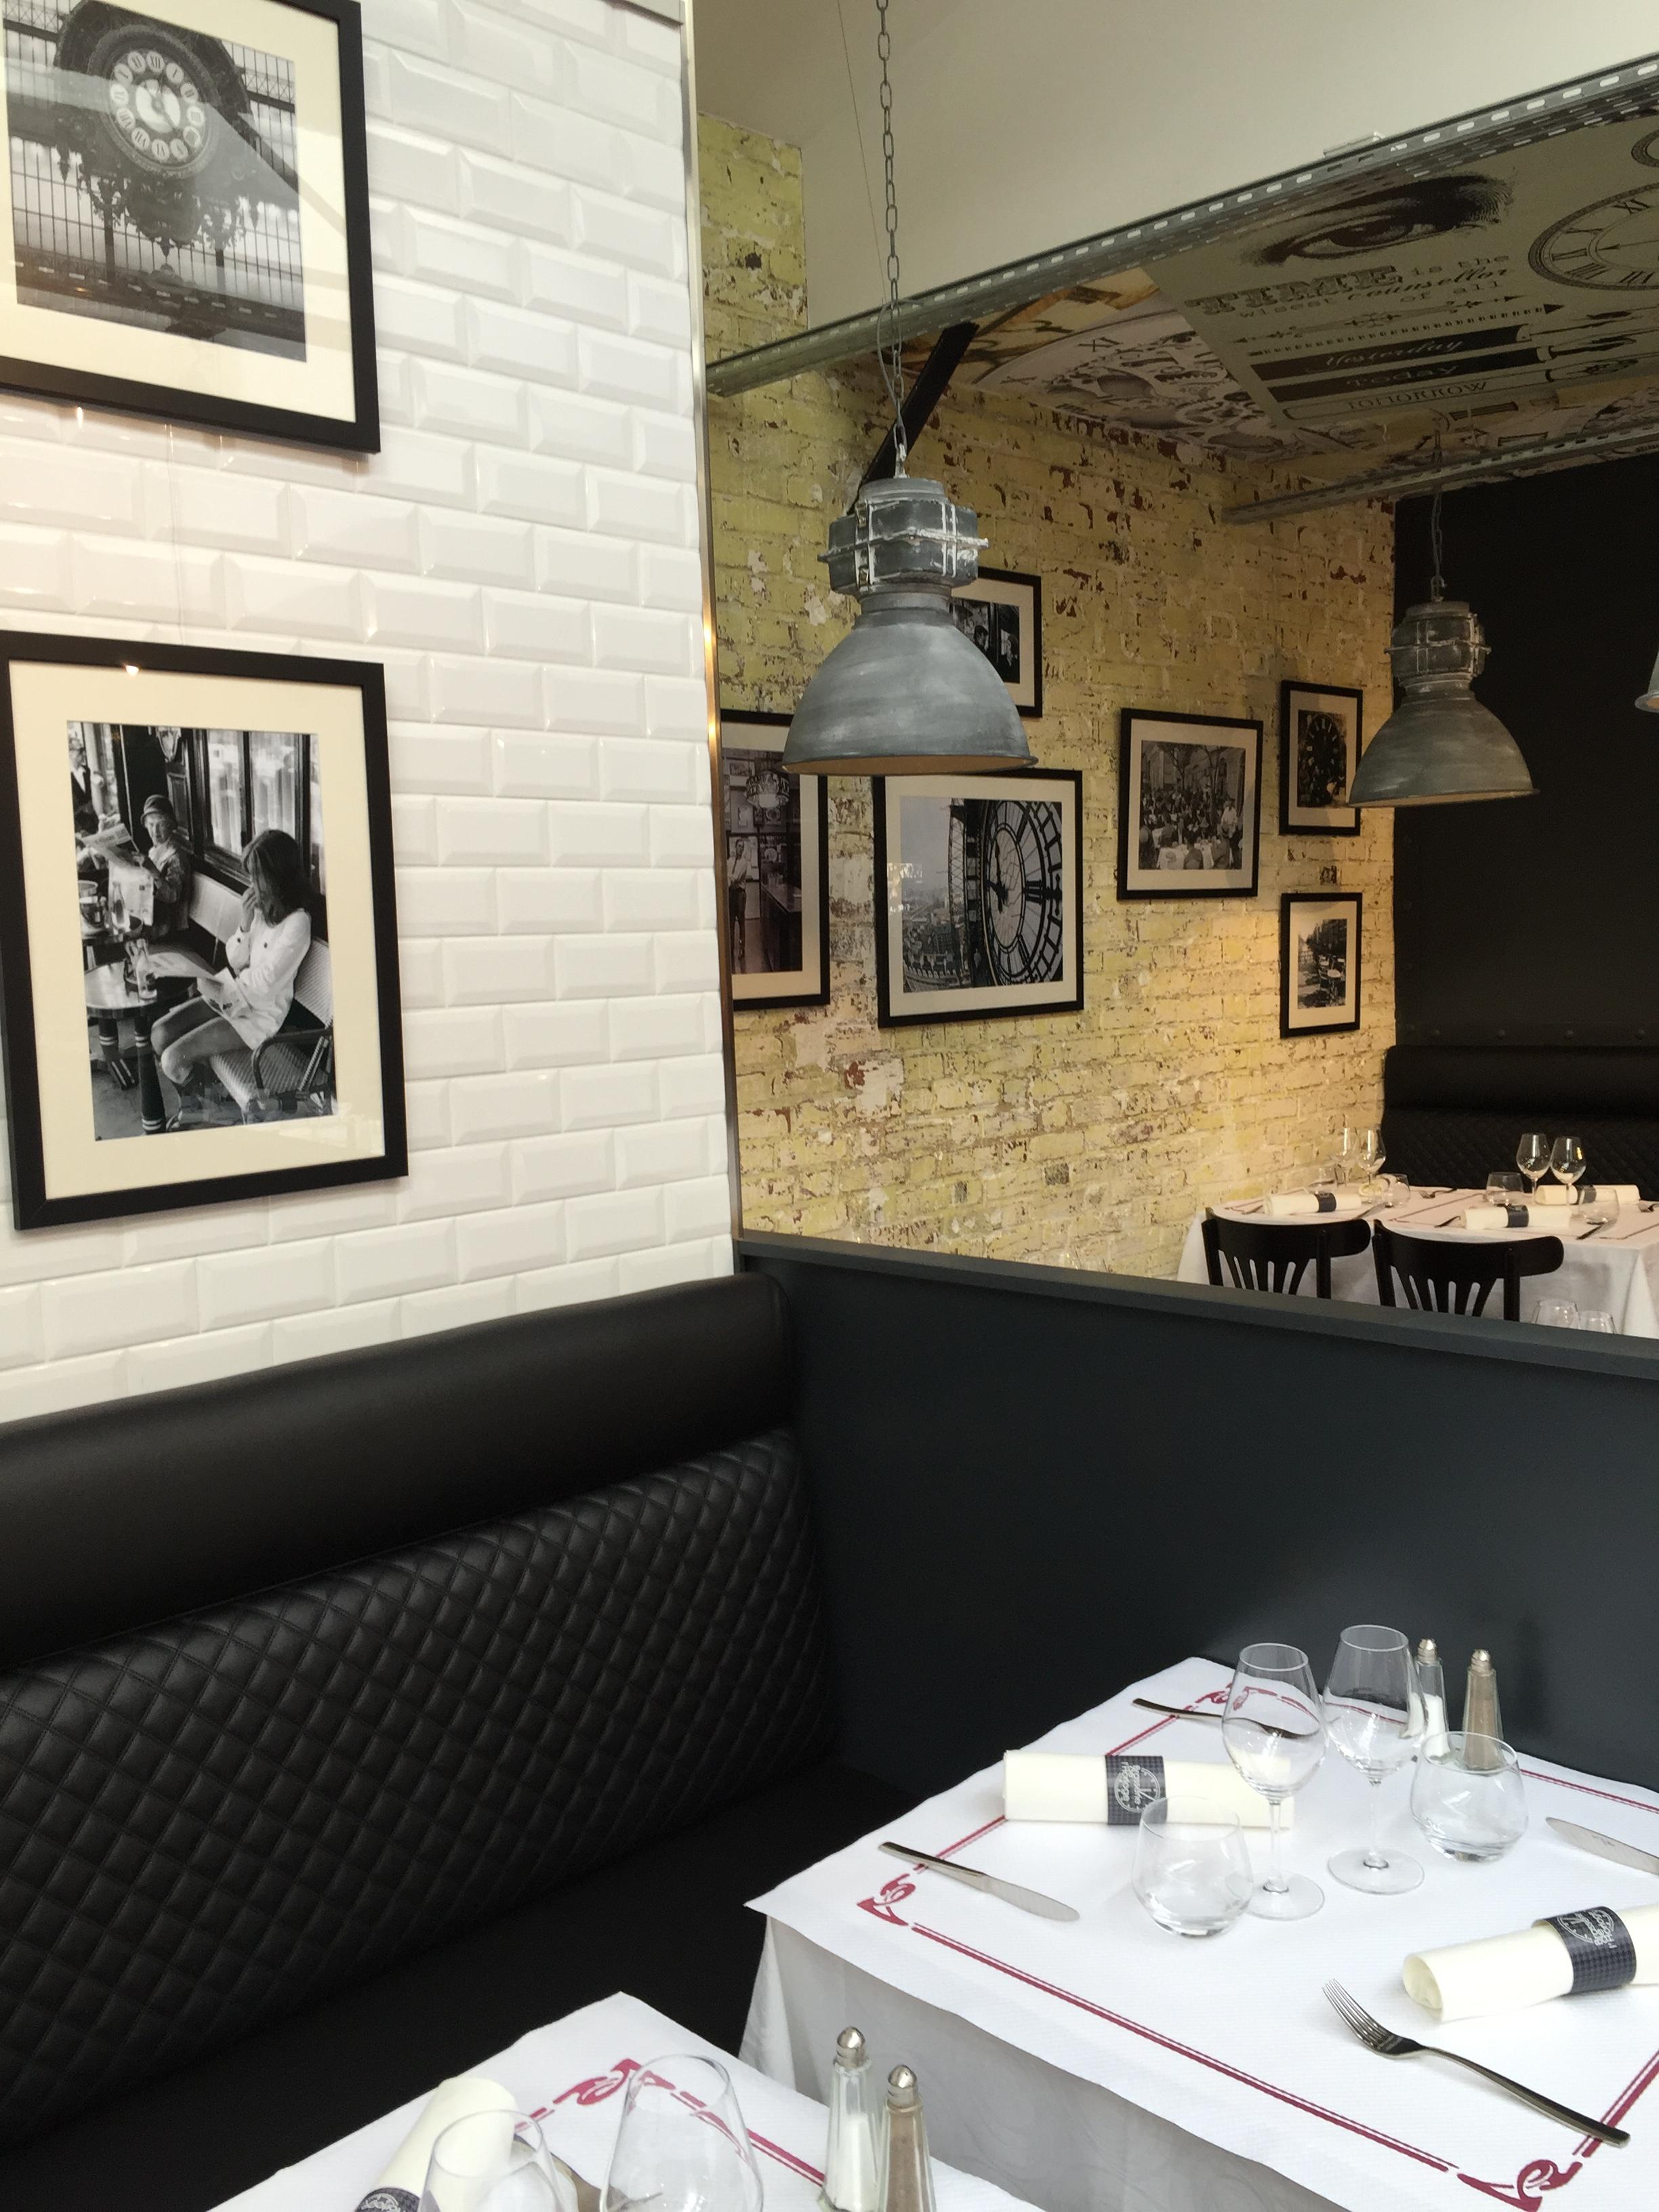 decor - Brasserie de L'Horloge - Amiens